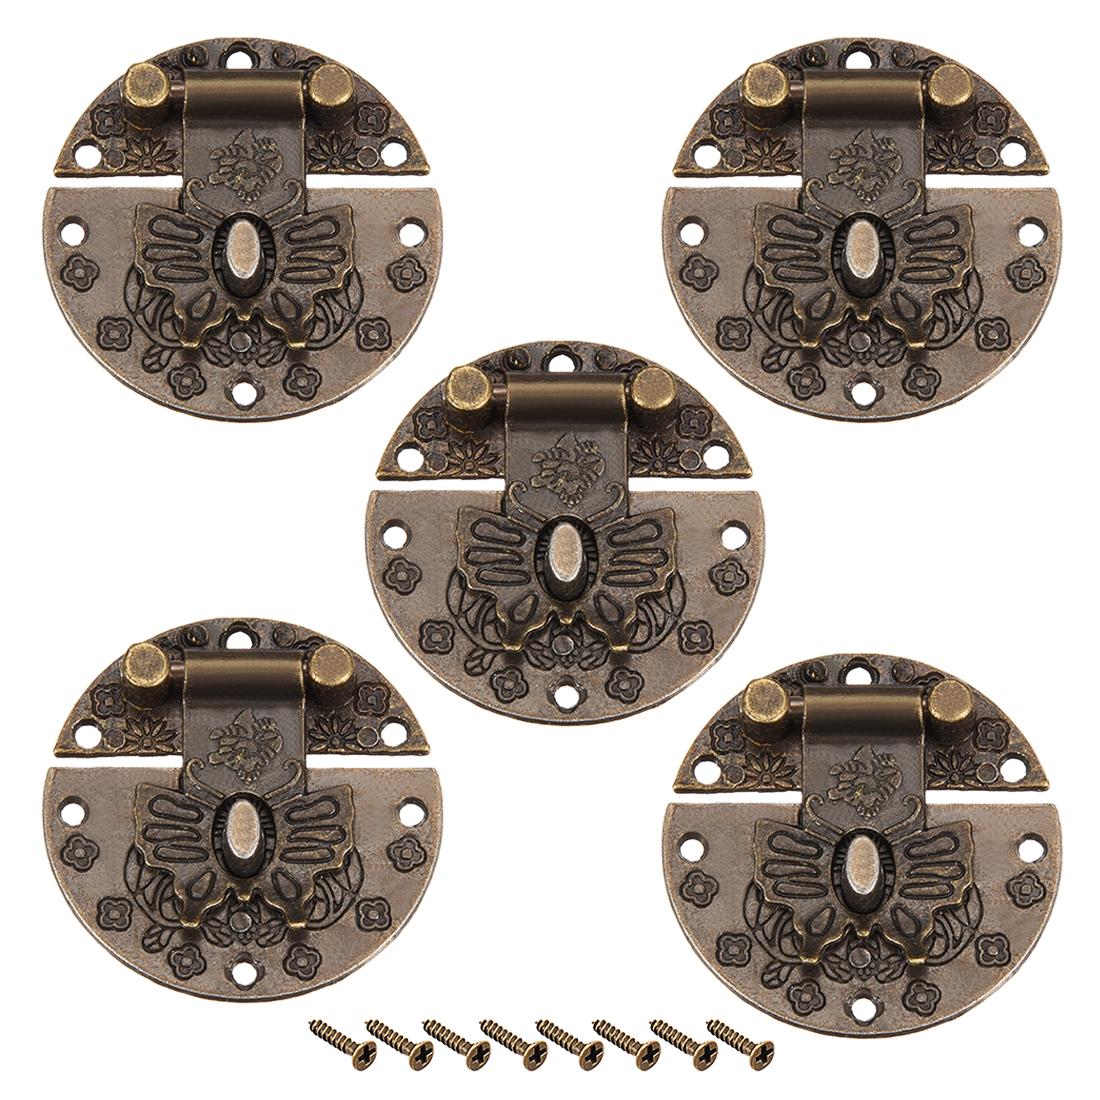 5 Sets Wood Case Chest Box Rectangle Clasp Closure Hasp Latches Bronze Tone 40mm